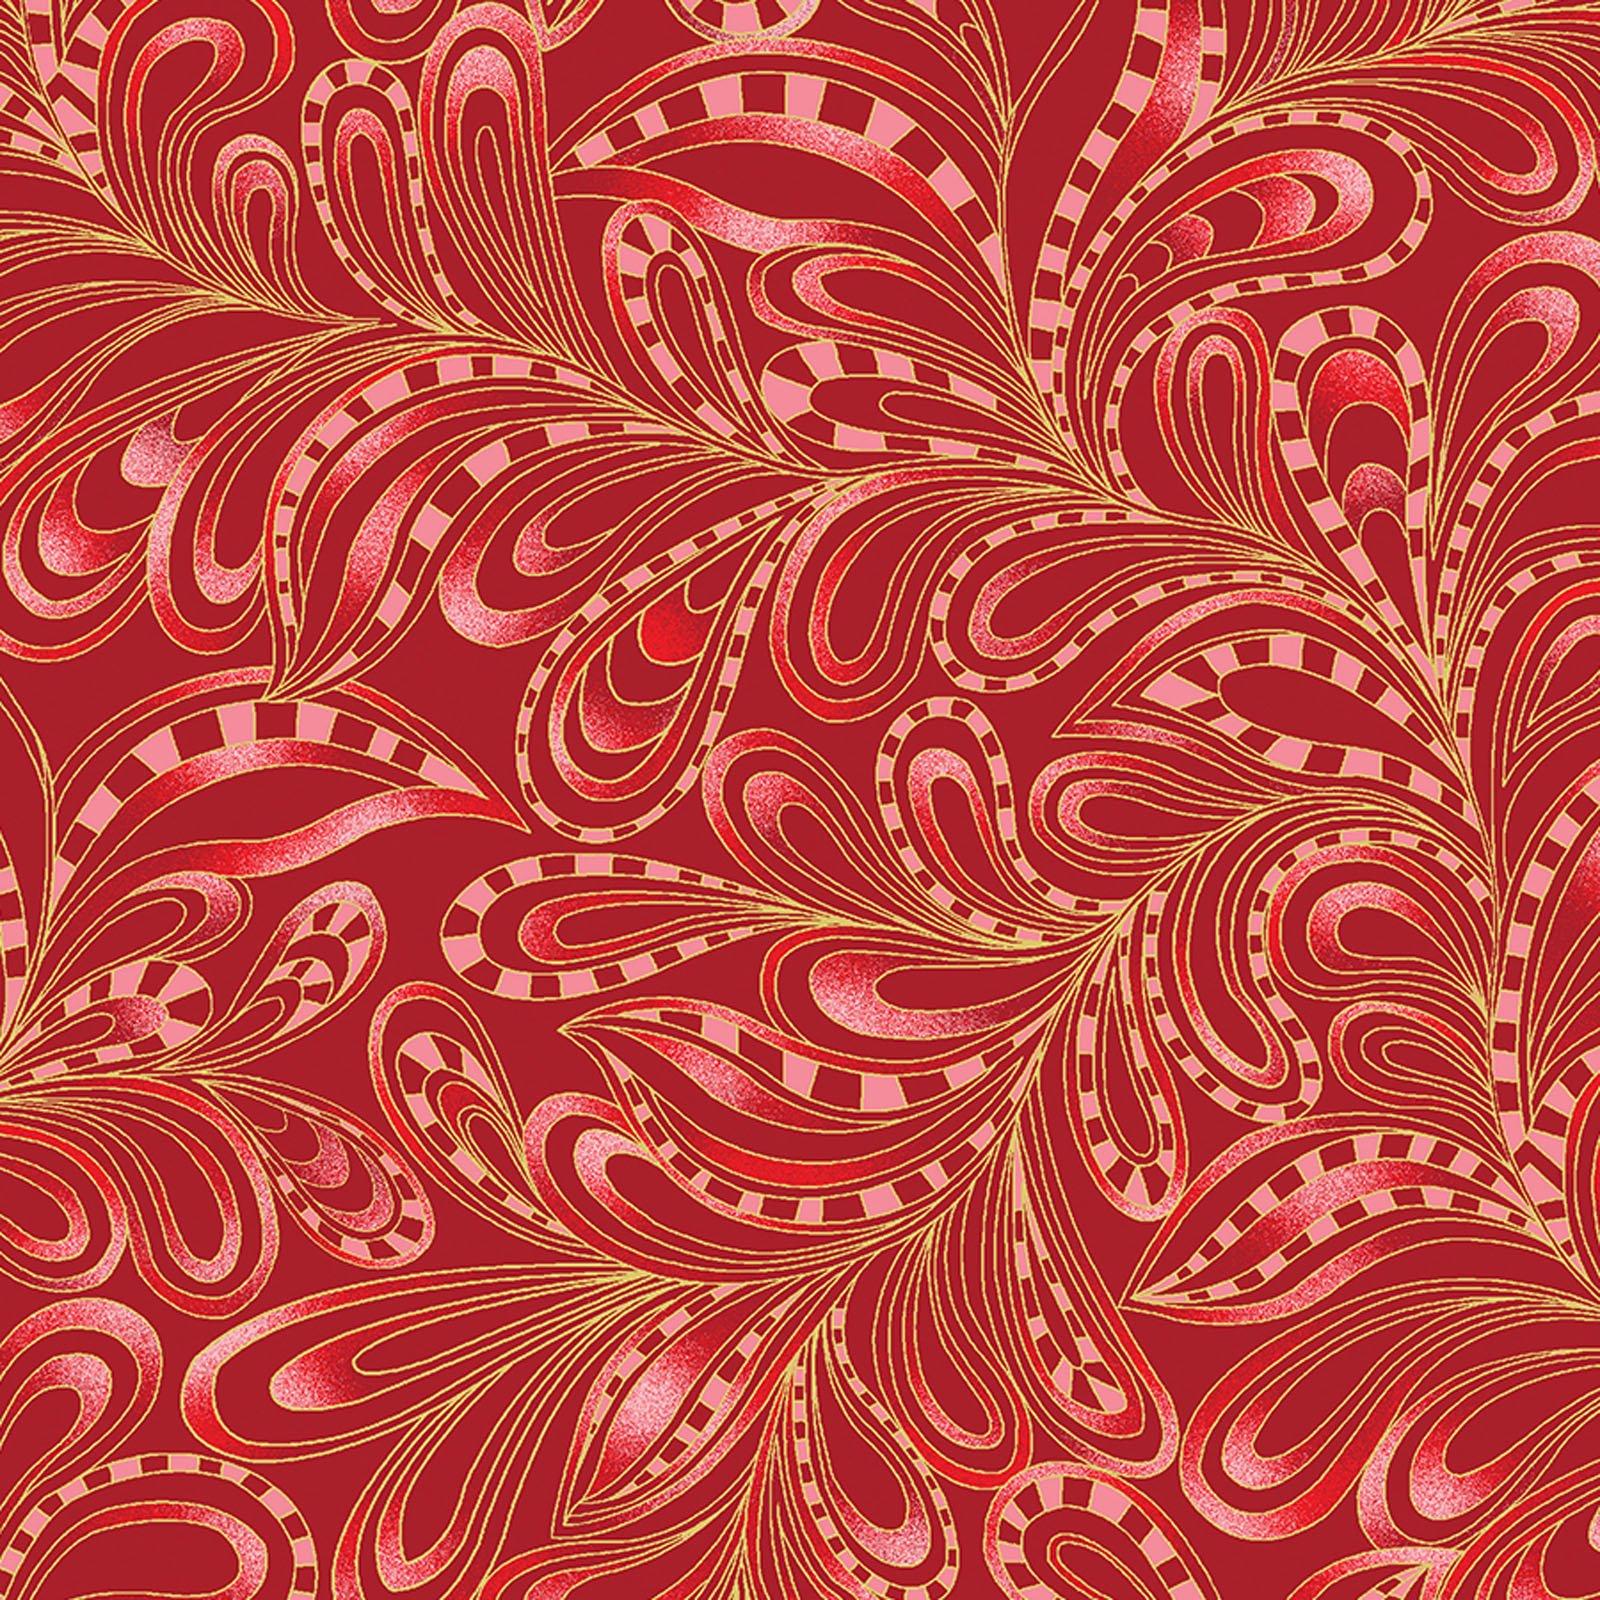 Featherly Paisley Rouge<br/>Benartex 7555M-20